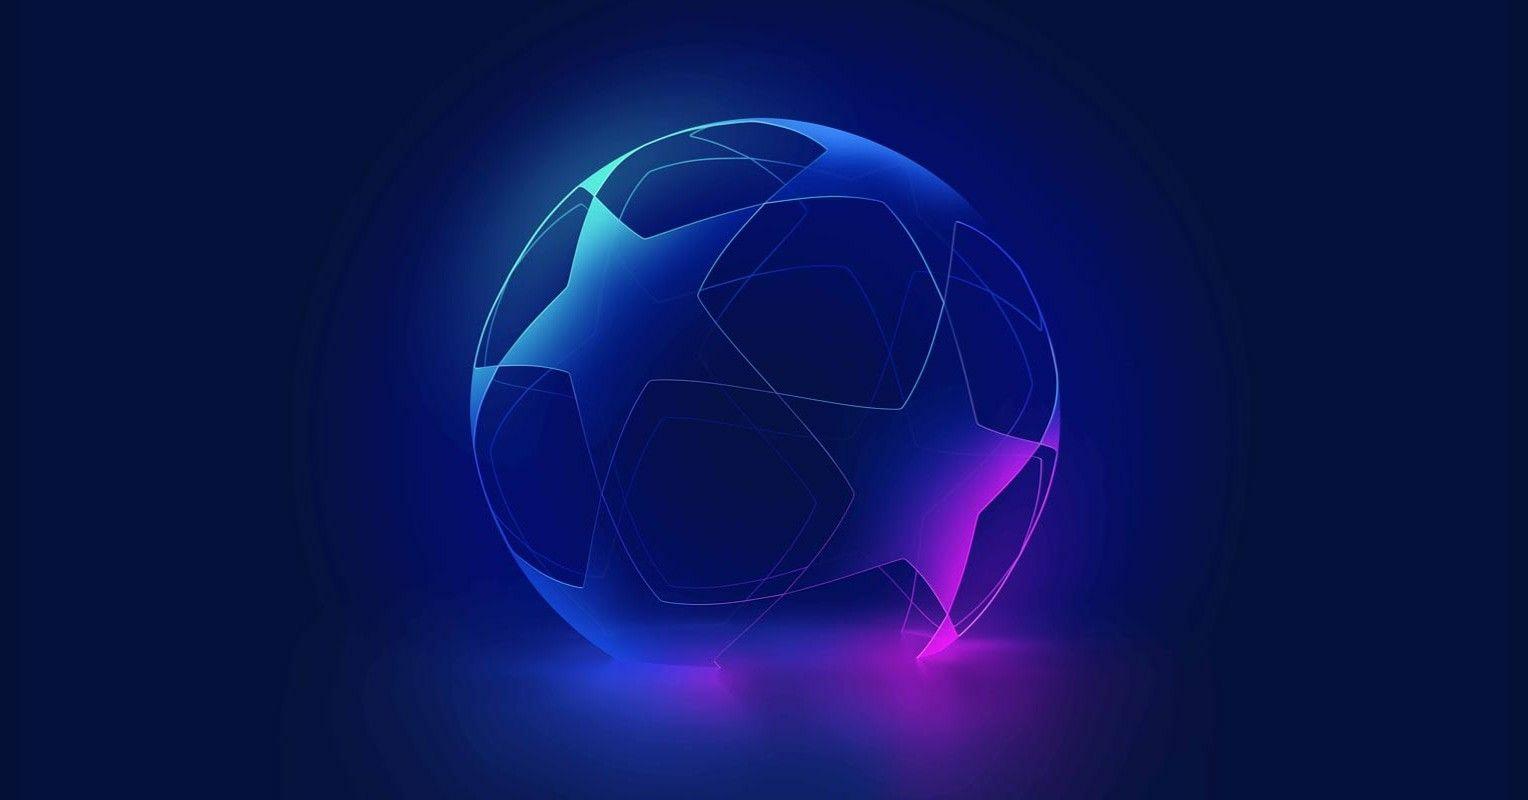 uefa champions league champions league uefa champions league champions league logo uefa champions league champions